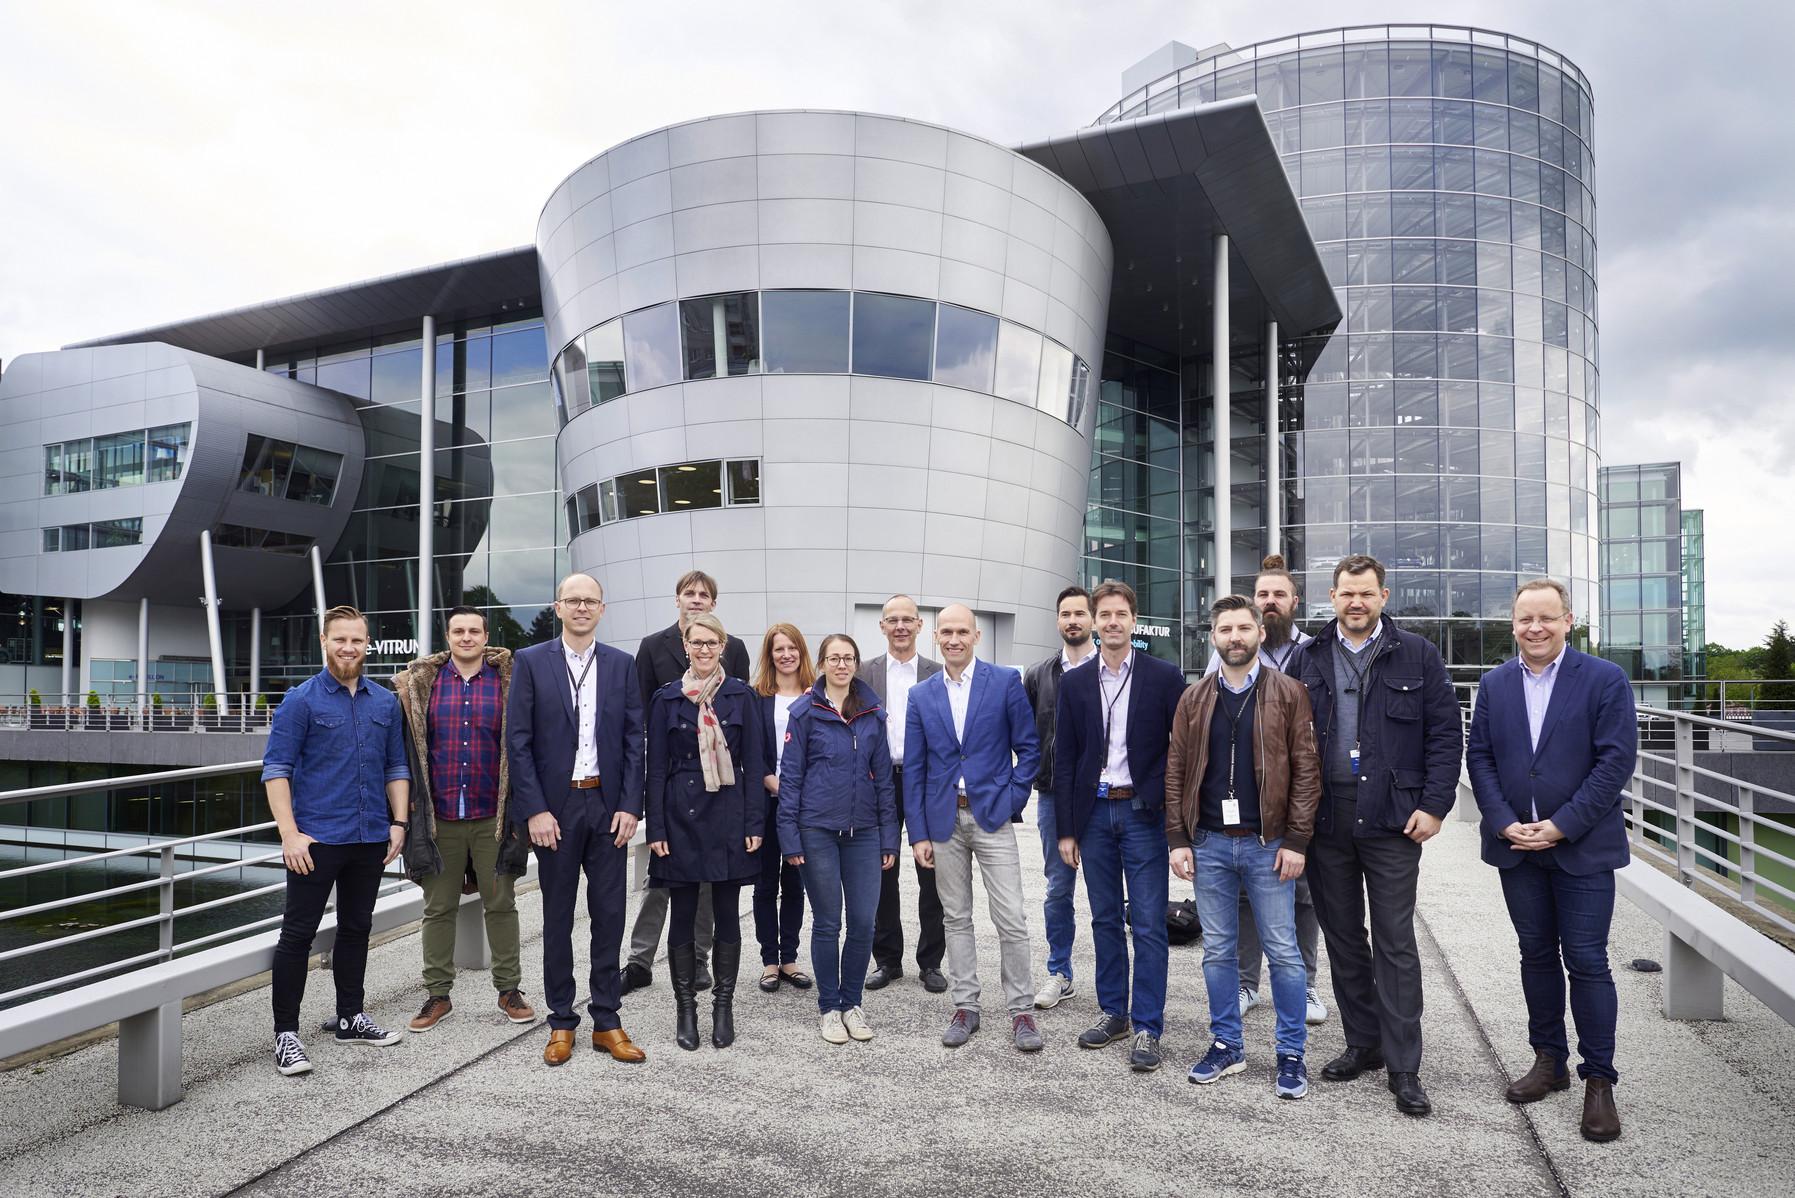 Volkswagen Dresden Gläserne Manufaktur Startups